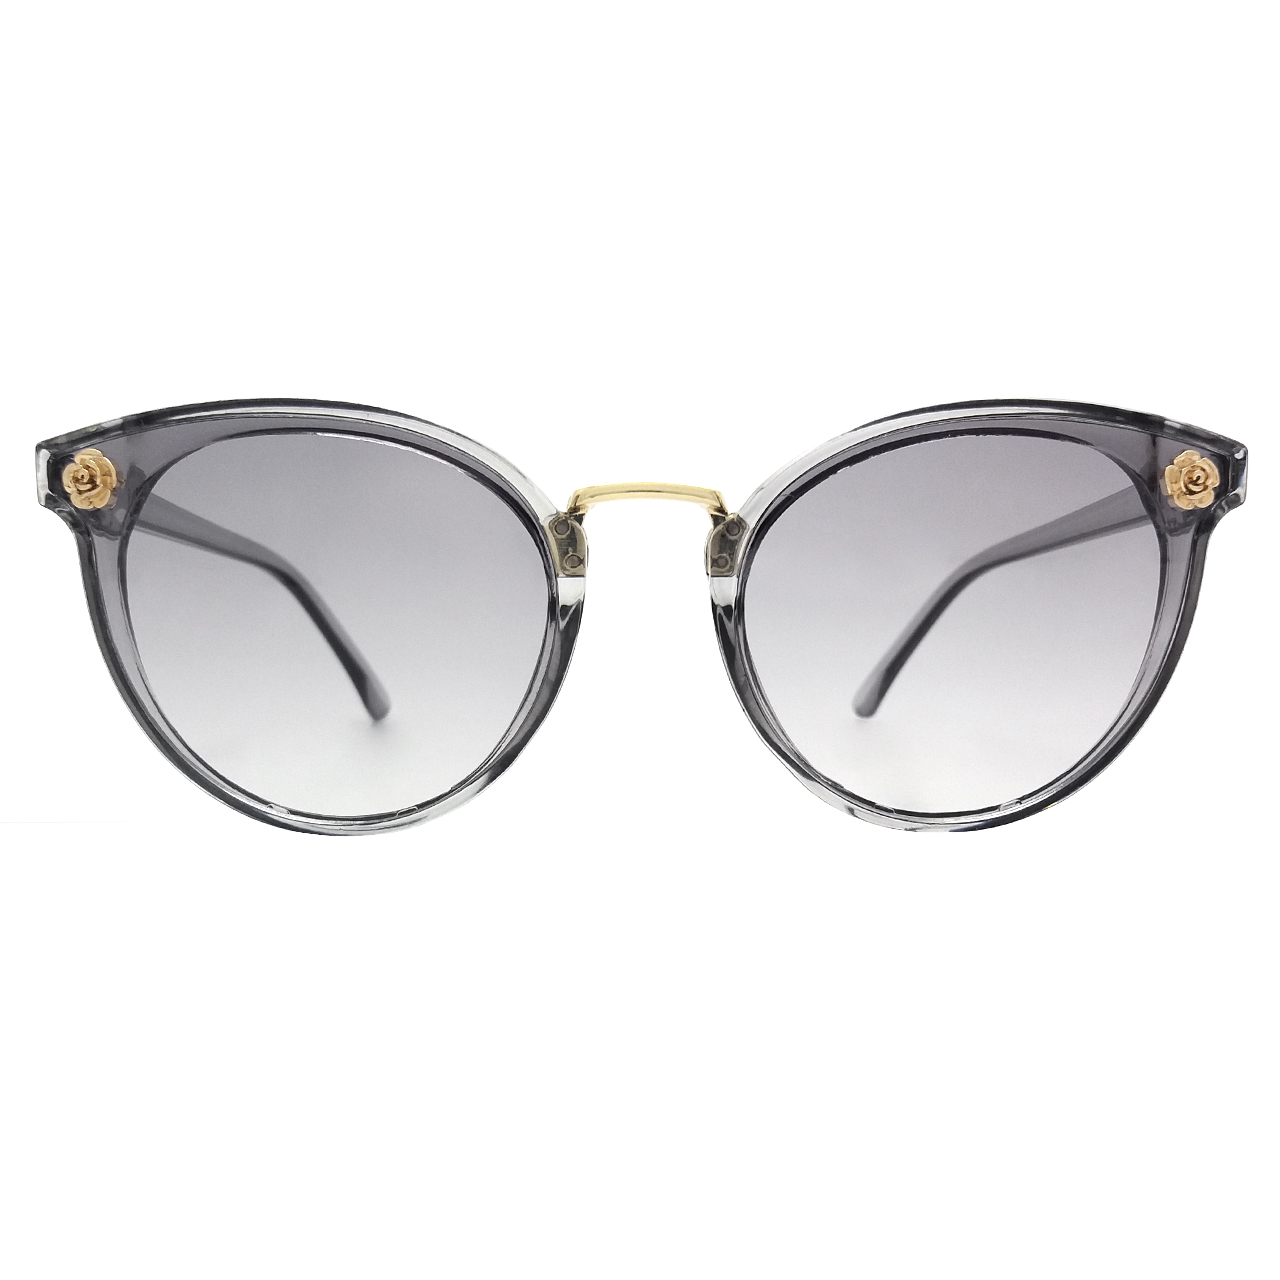 عینک آفتابی زنانه کد 399